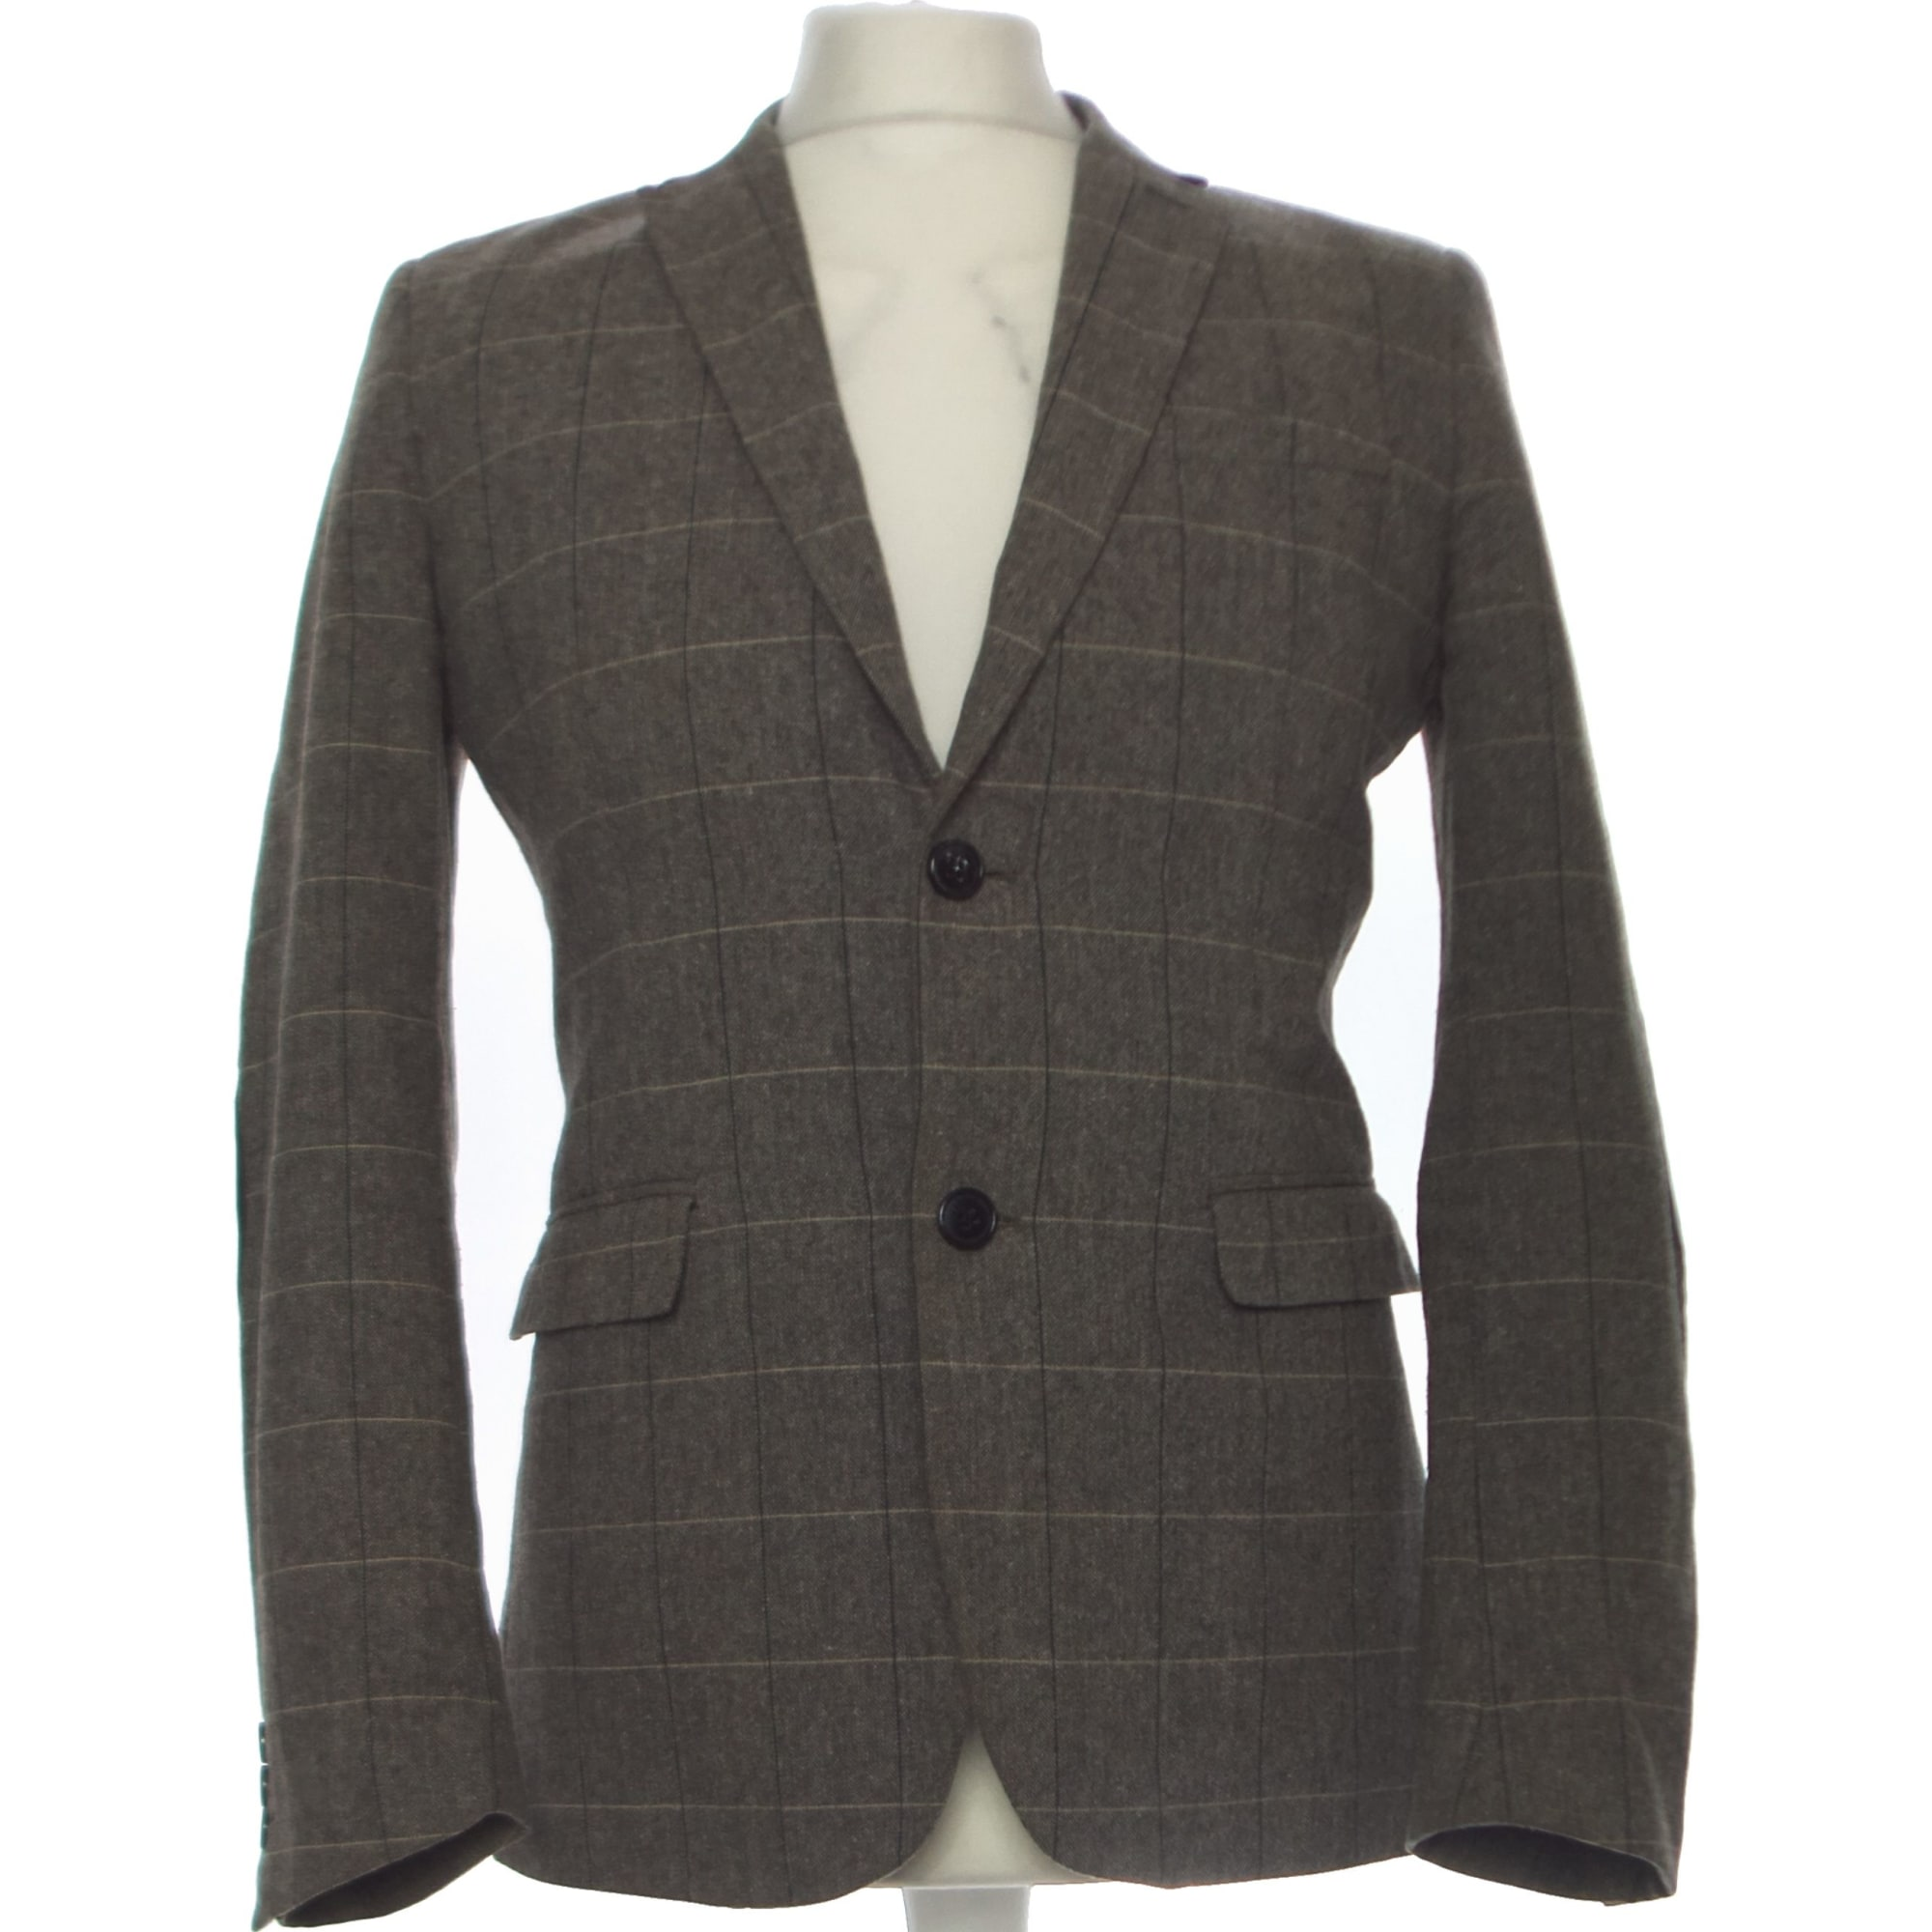 Suit Jacket H&M Brown